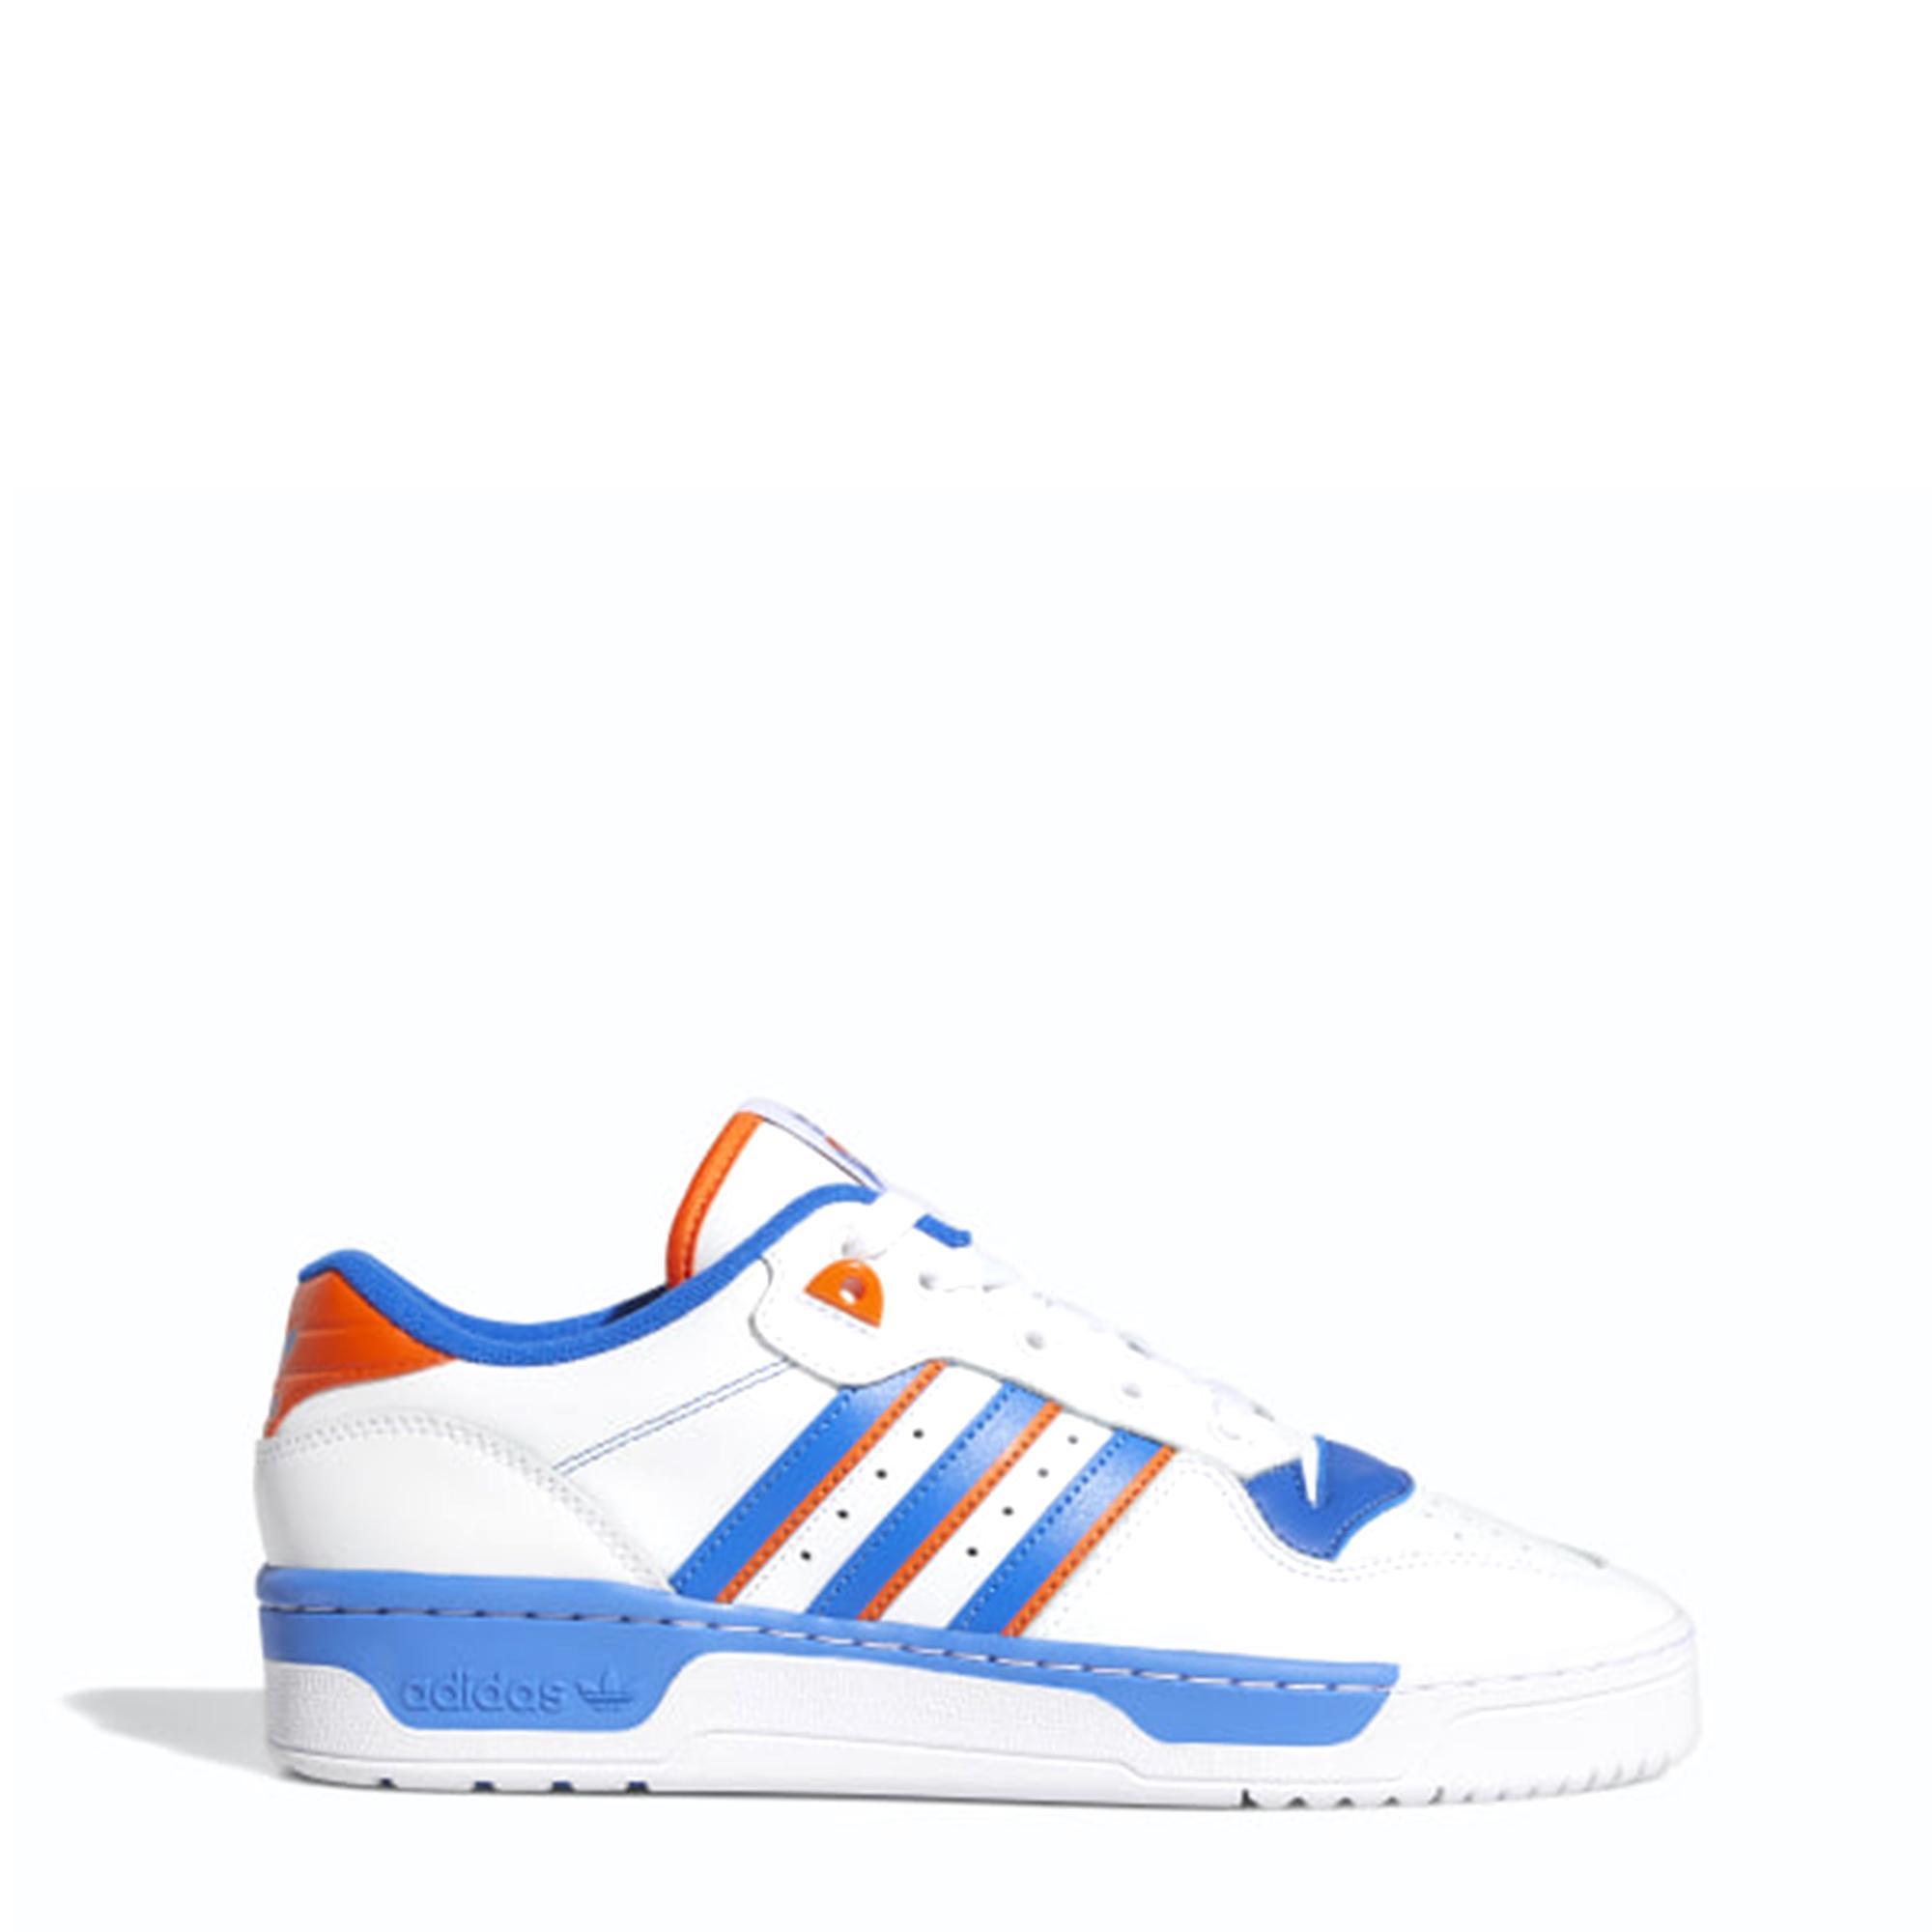 Adidas Rivalry Low White blue orange